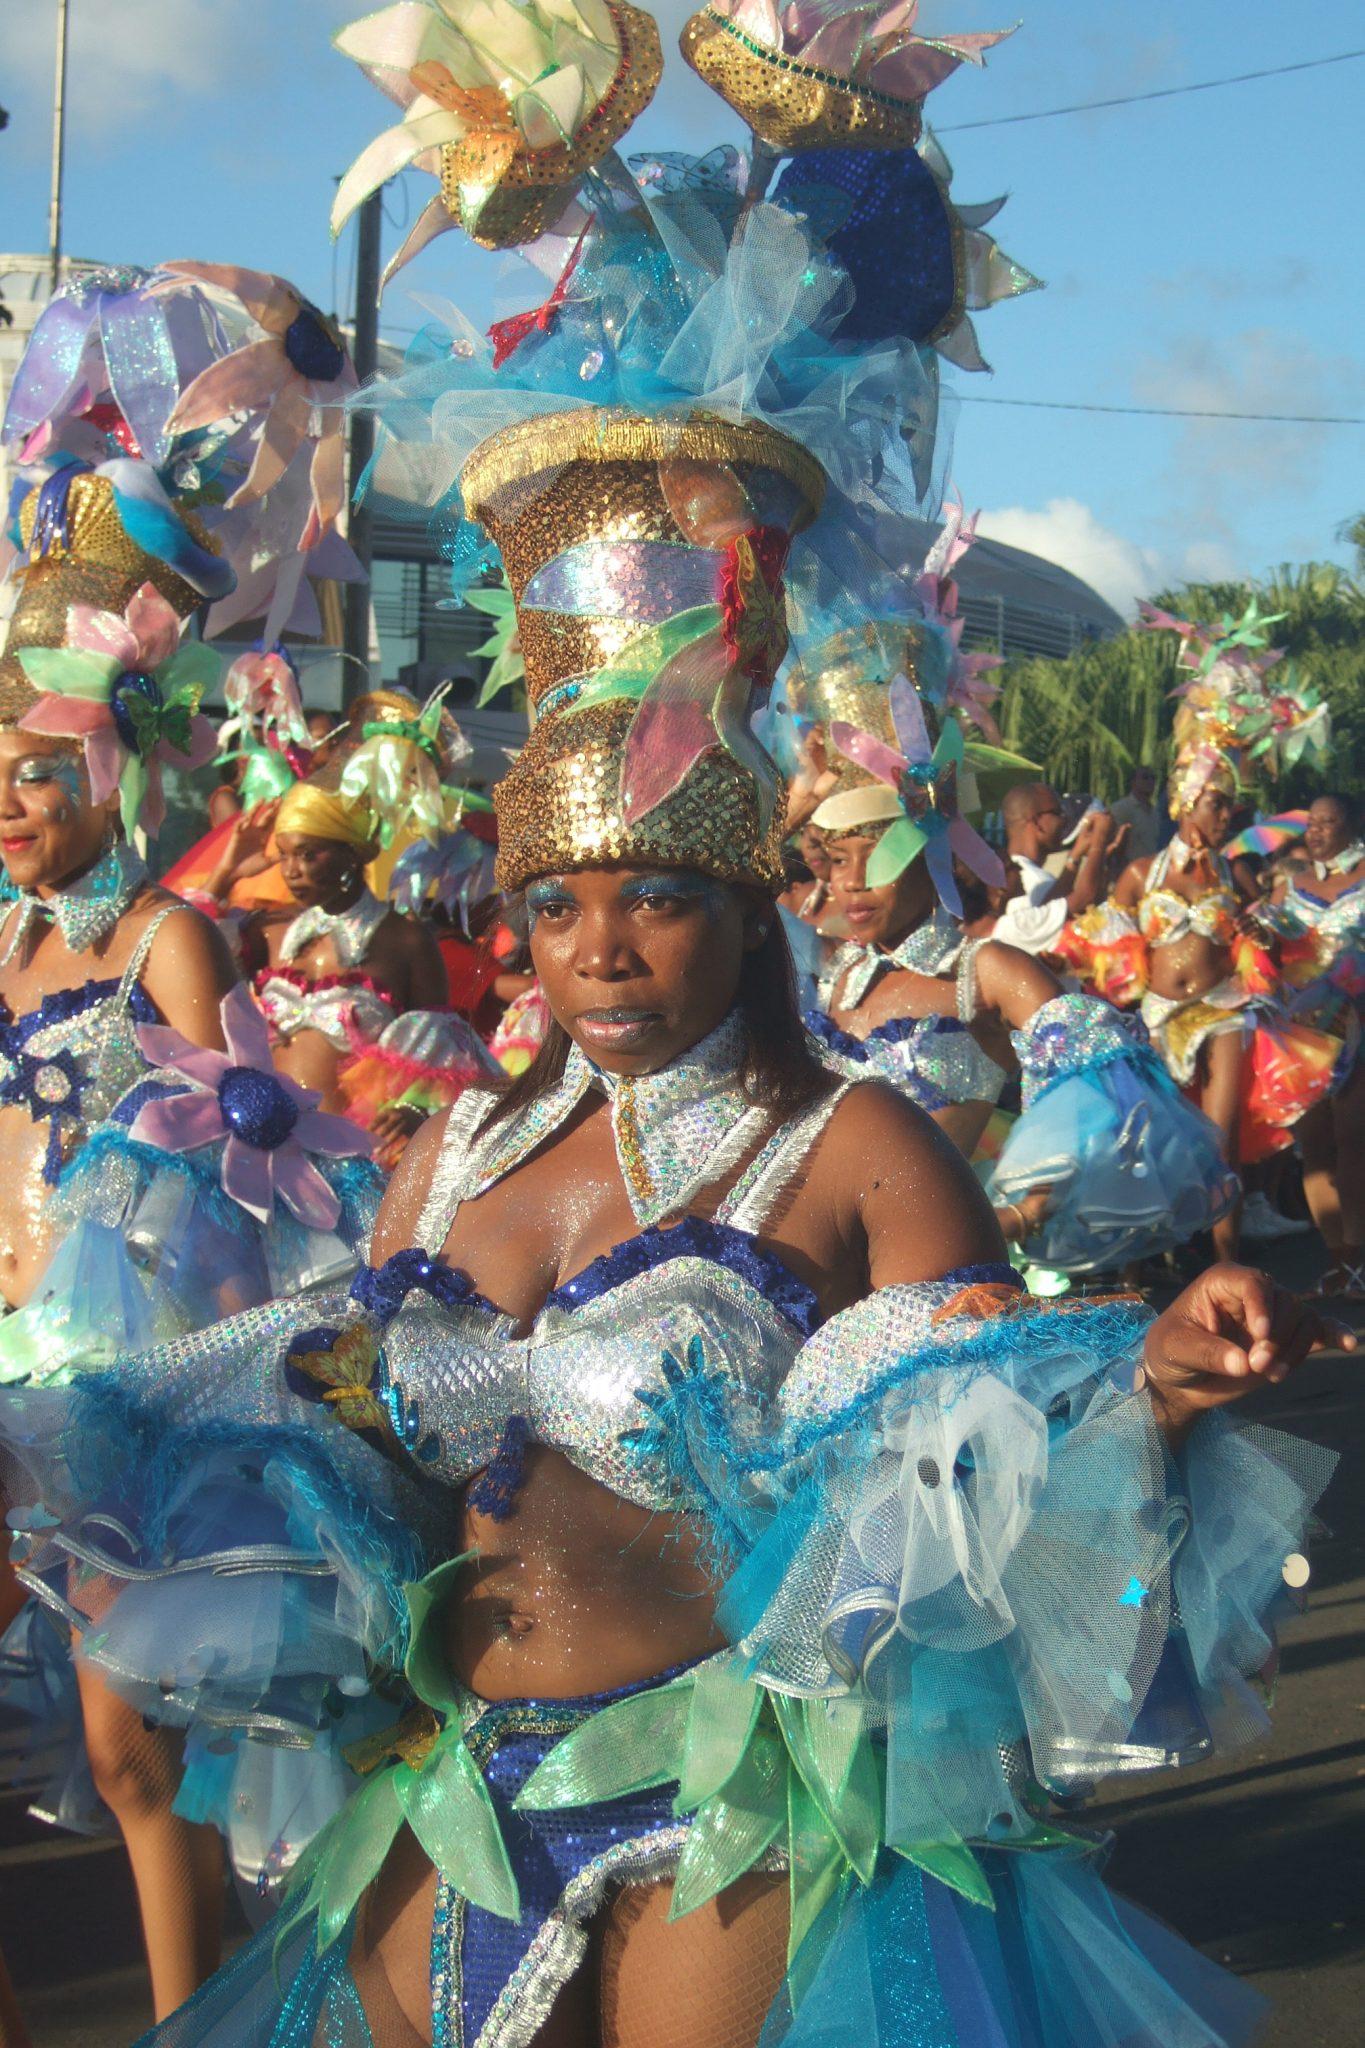 Déguisement carnaval Guadeloupe